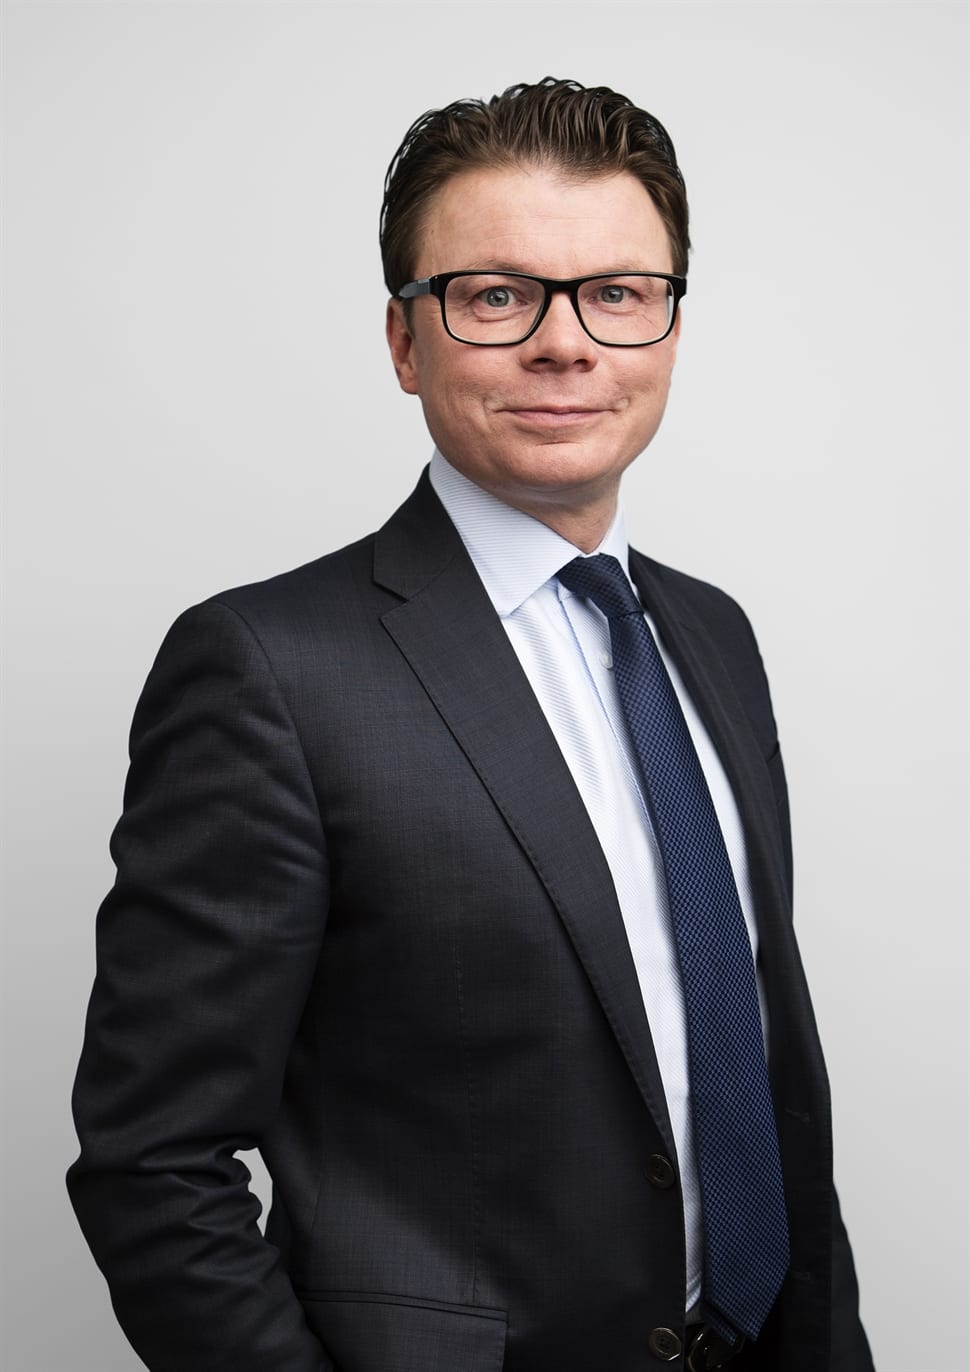 CEO of Mandatum Life Petri Niemisvirta